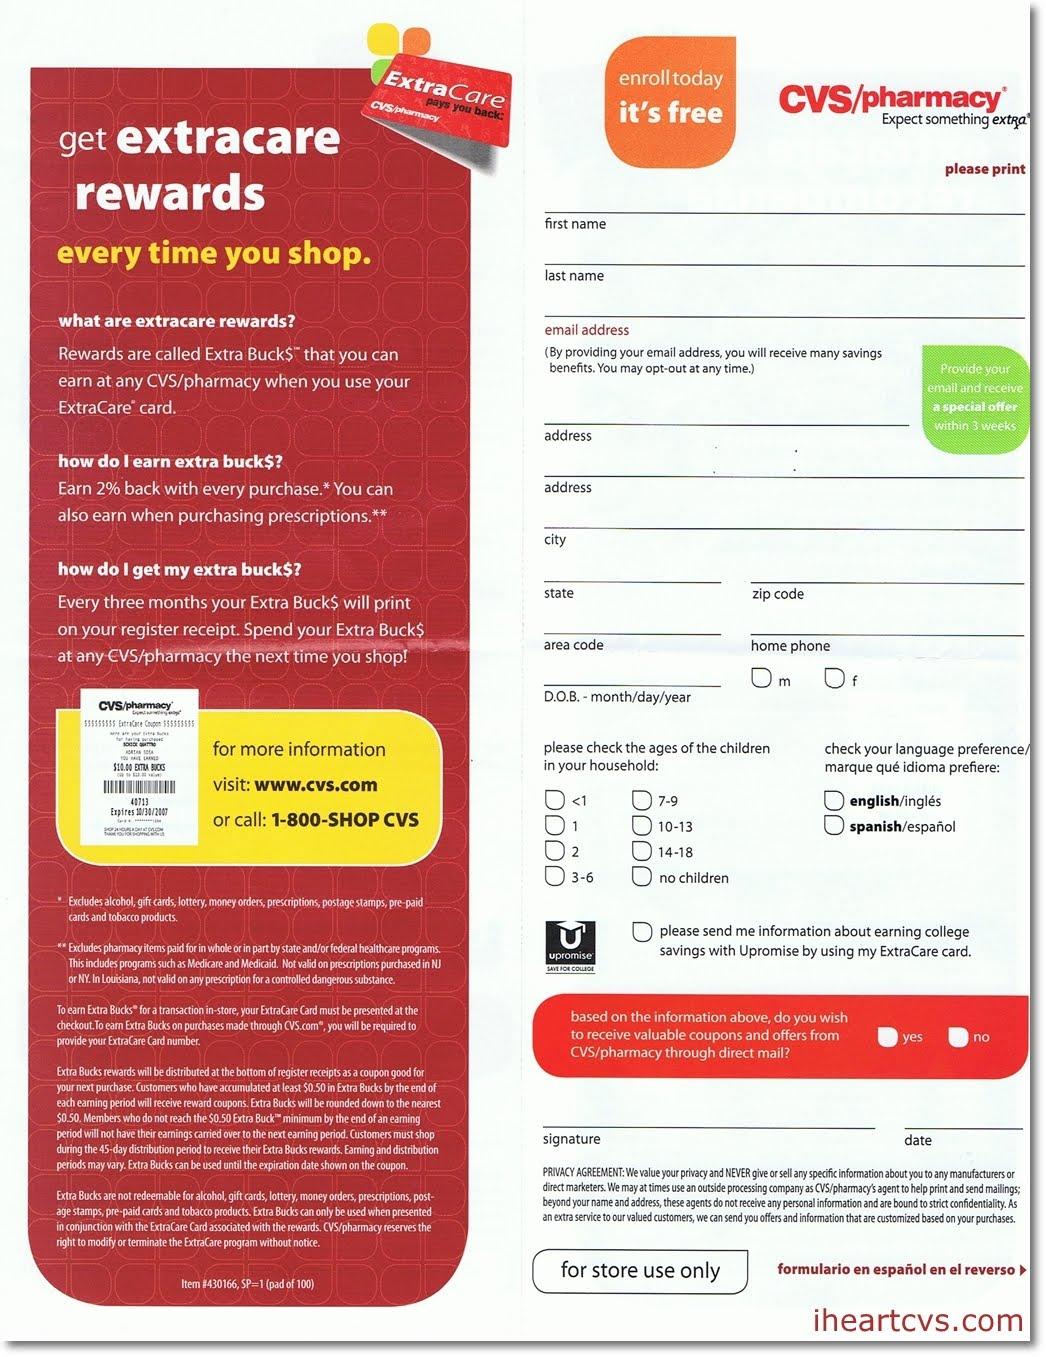 How the CVS Extra Care Card Helps You Save Money